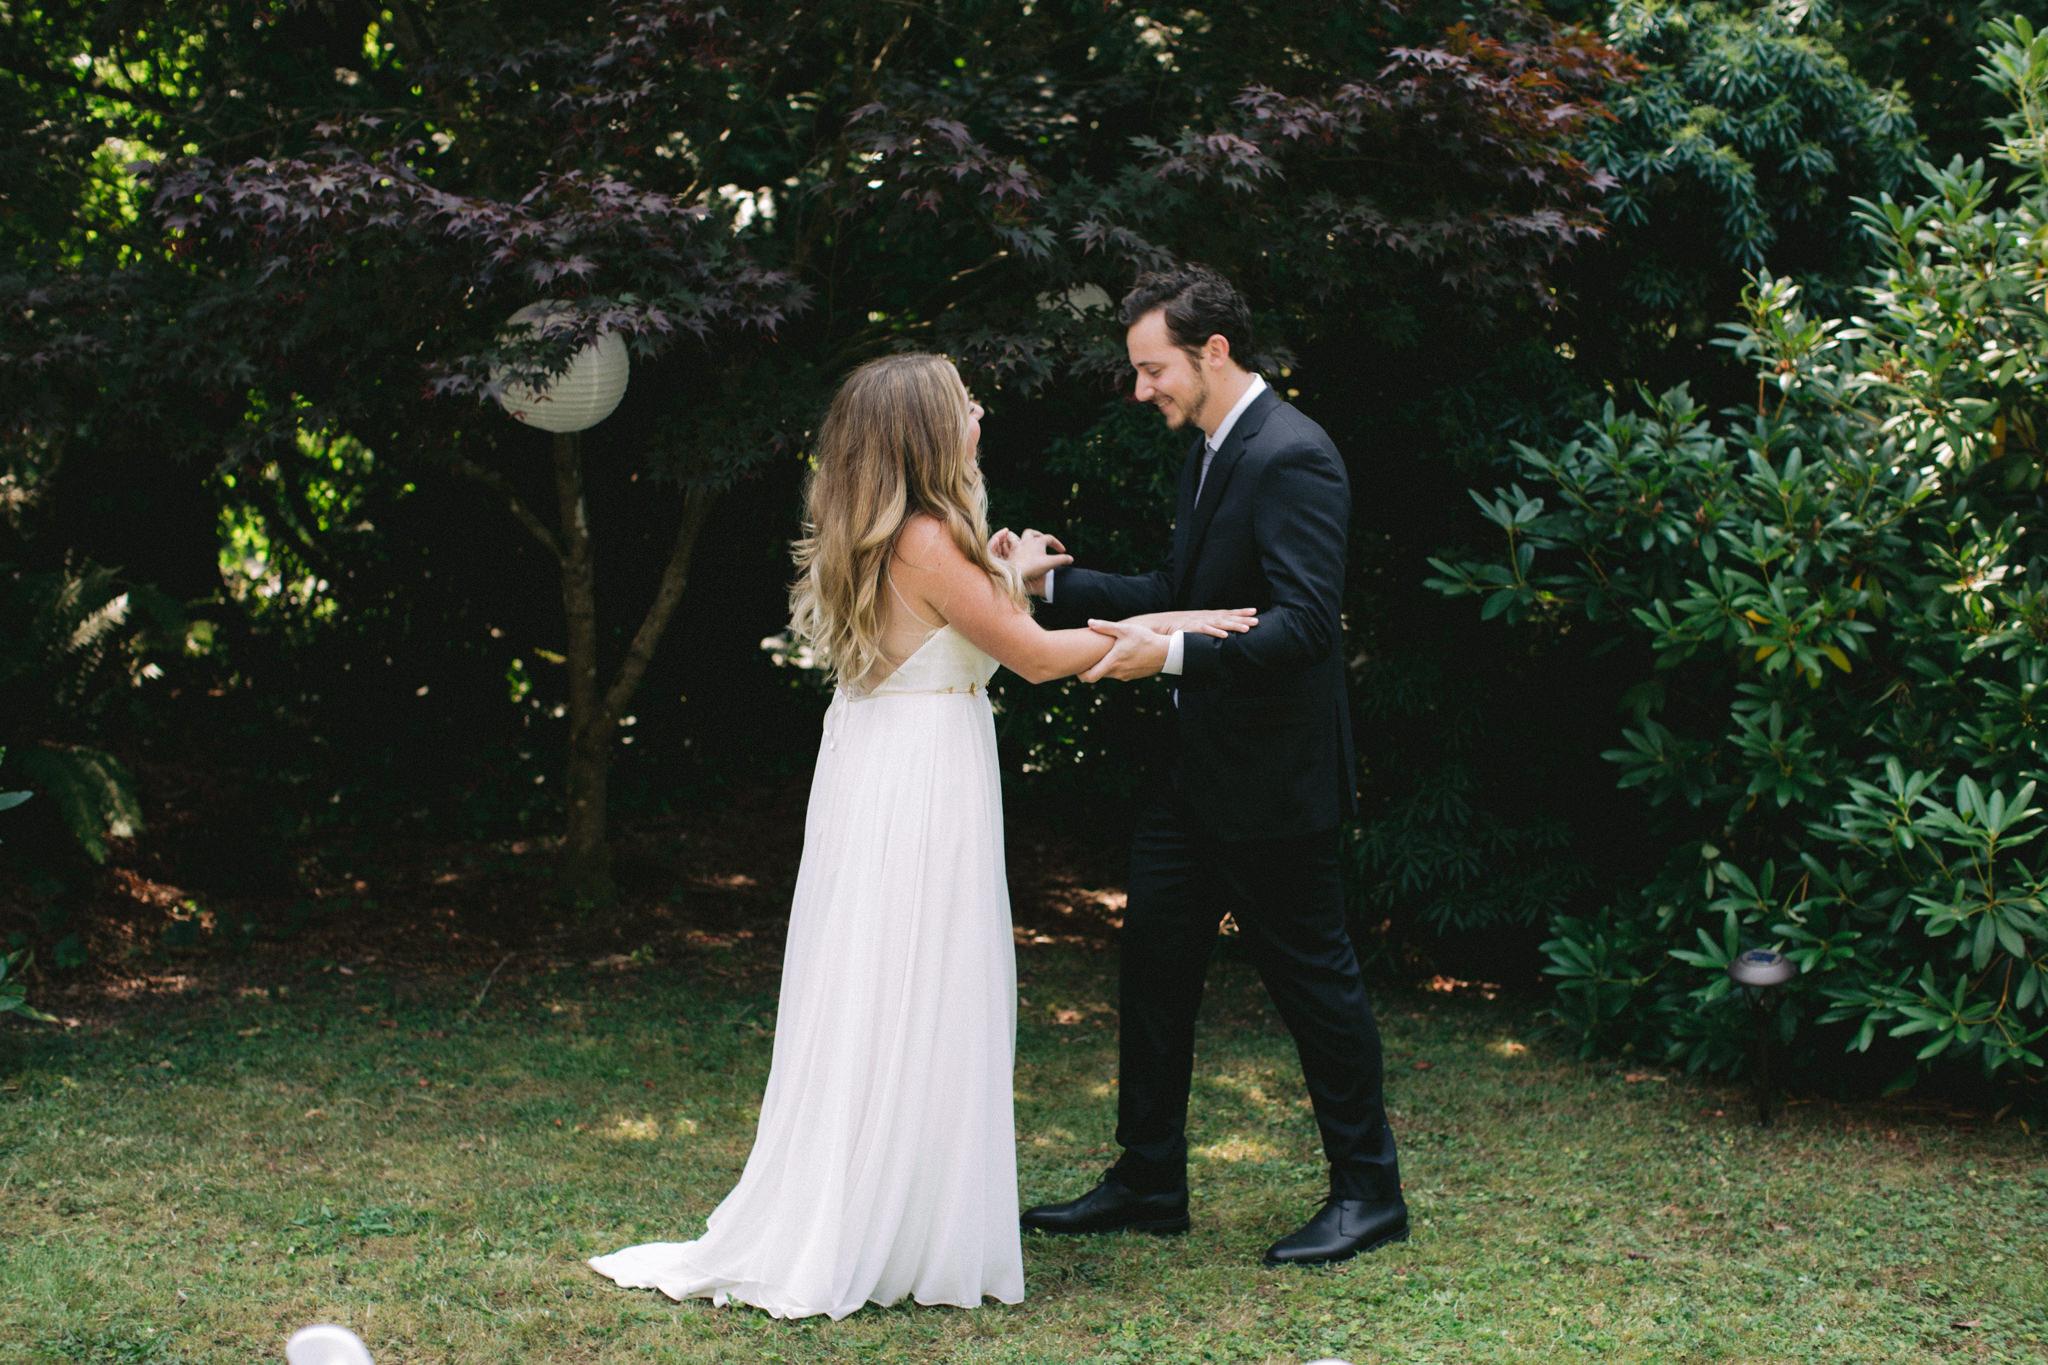 Backyard-Bainbridge-Island-Wedding-Alycia-Lovell-Photography-27.JPG